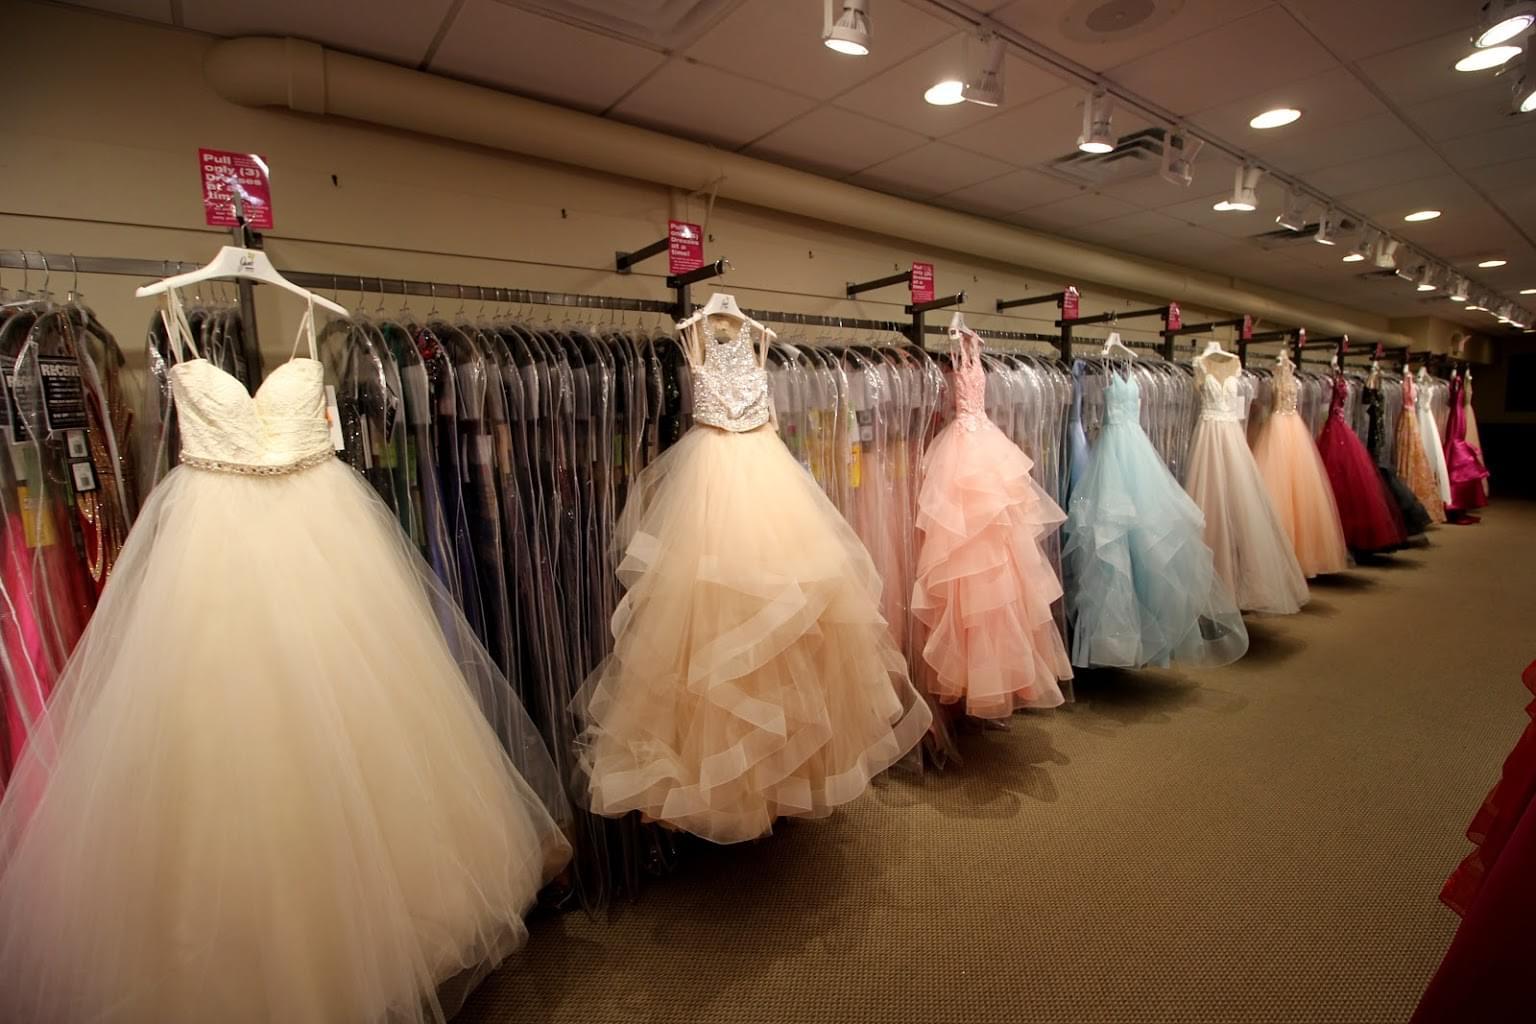 Jan's Boutique dress store in Cherry Hill, NJ dresses